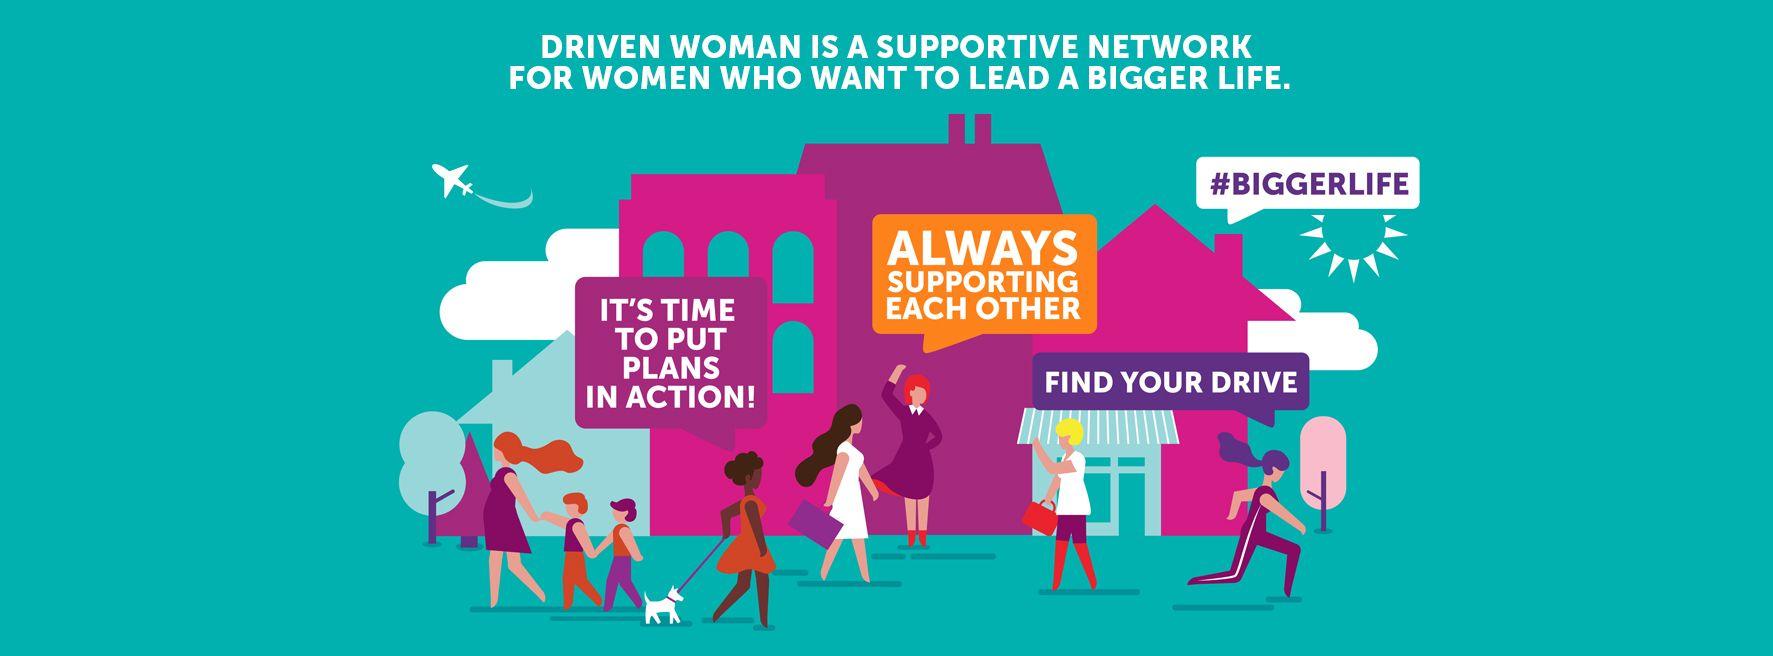 Driven Woman- A Woman's LifeWorking Group